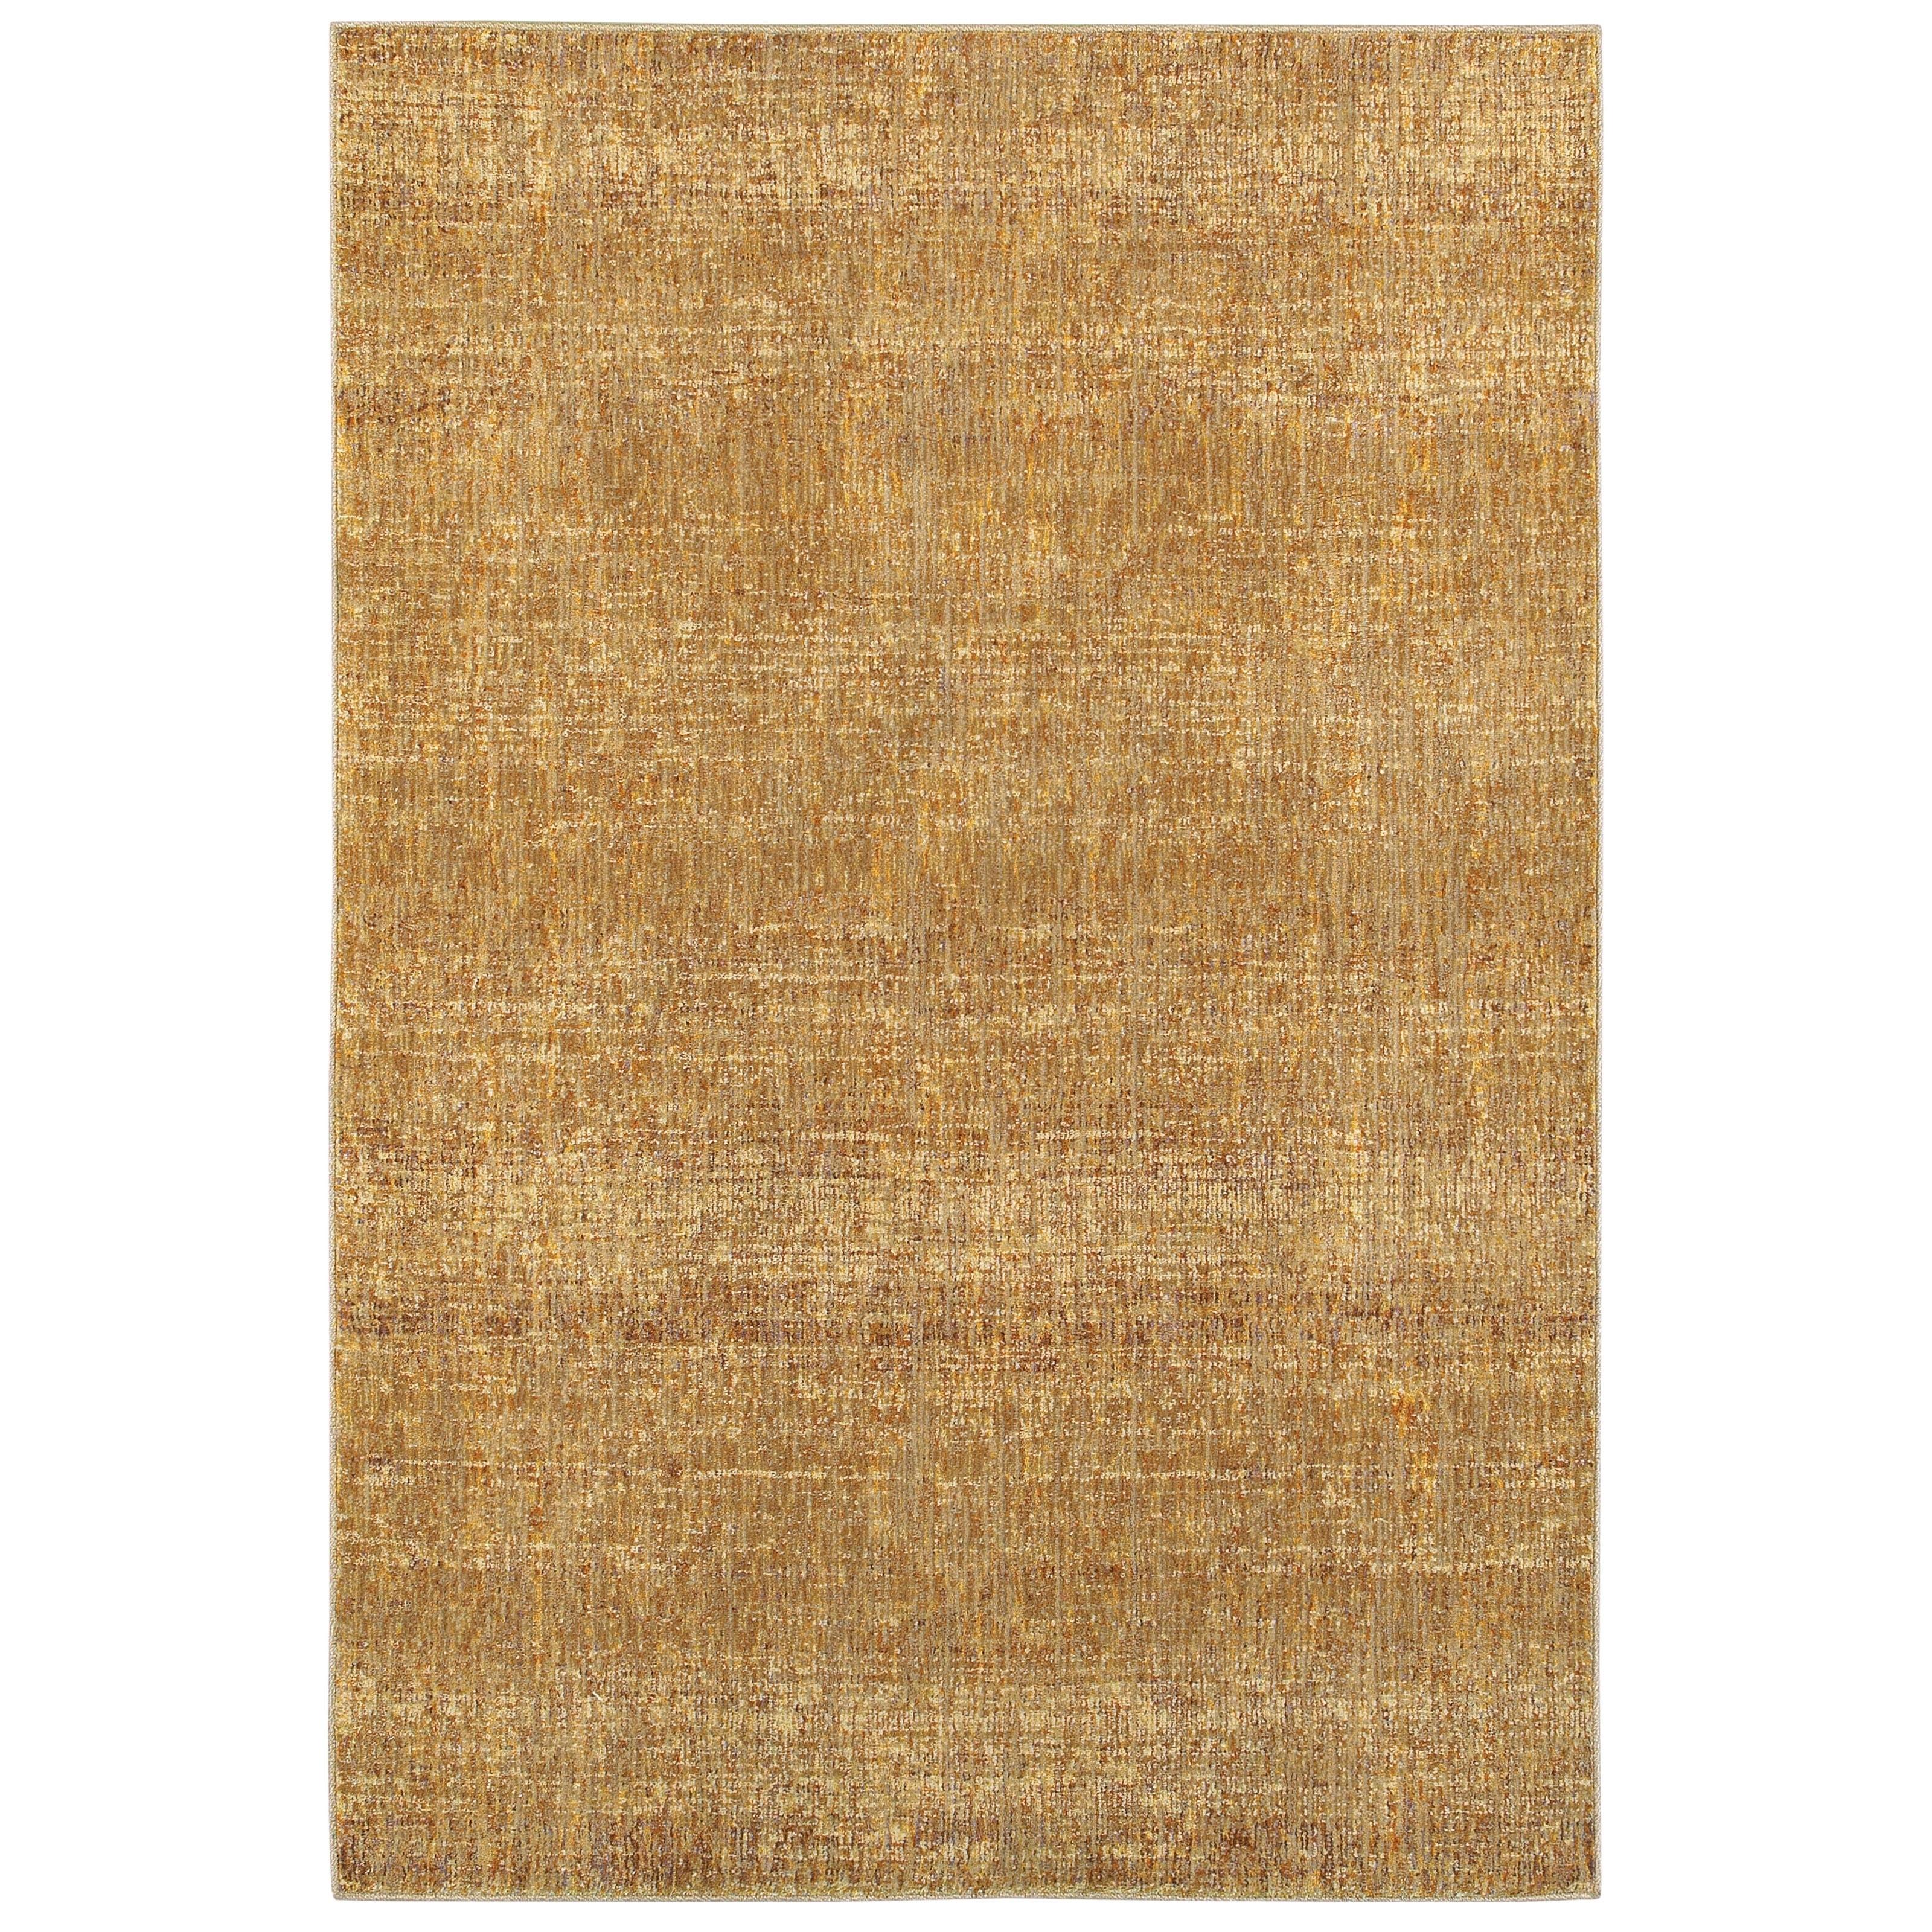 Carson Carrington Skelleftea Tonal Textures Gold/ Yellow Area Rug - 86 x 117 (86 x 117 - Gold/Yellow)